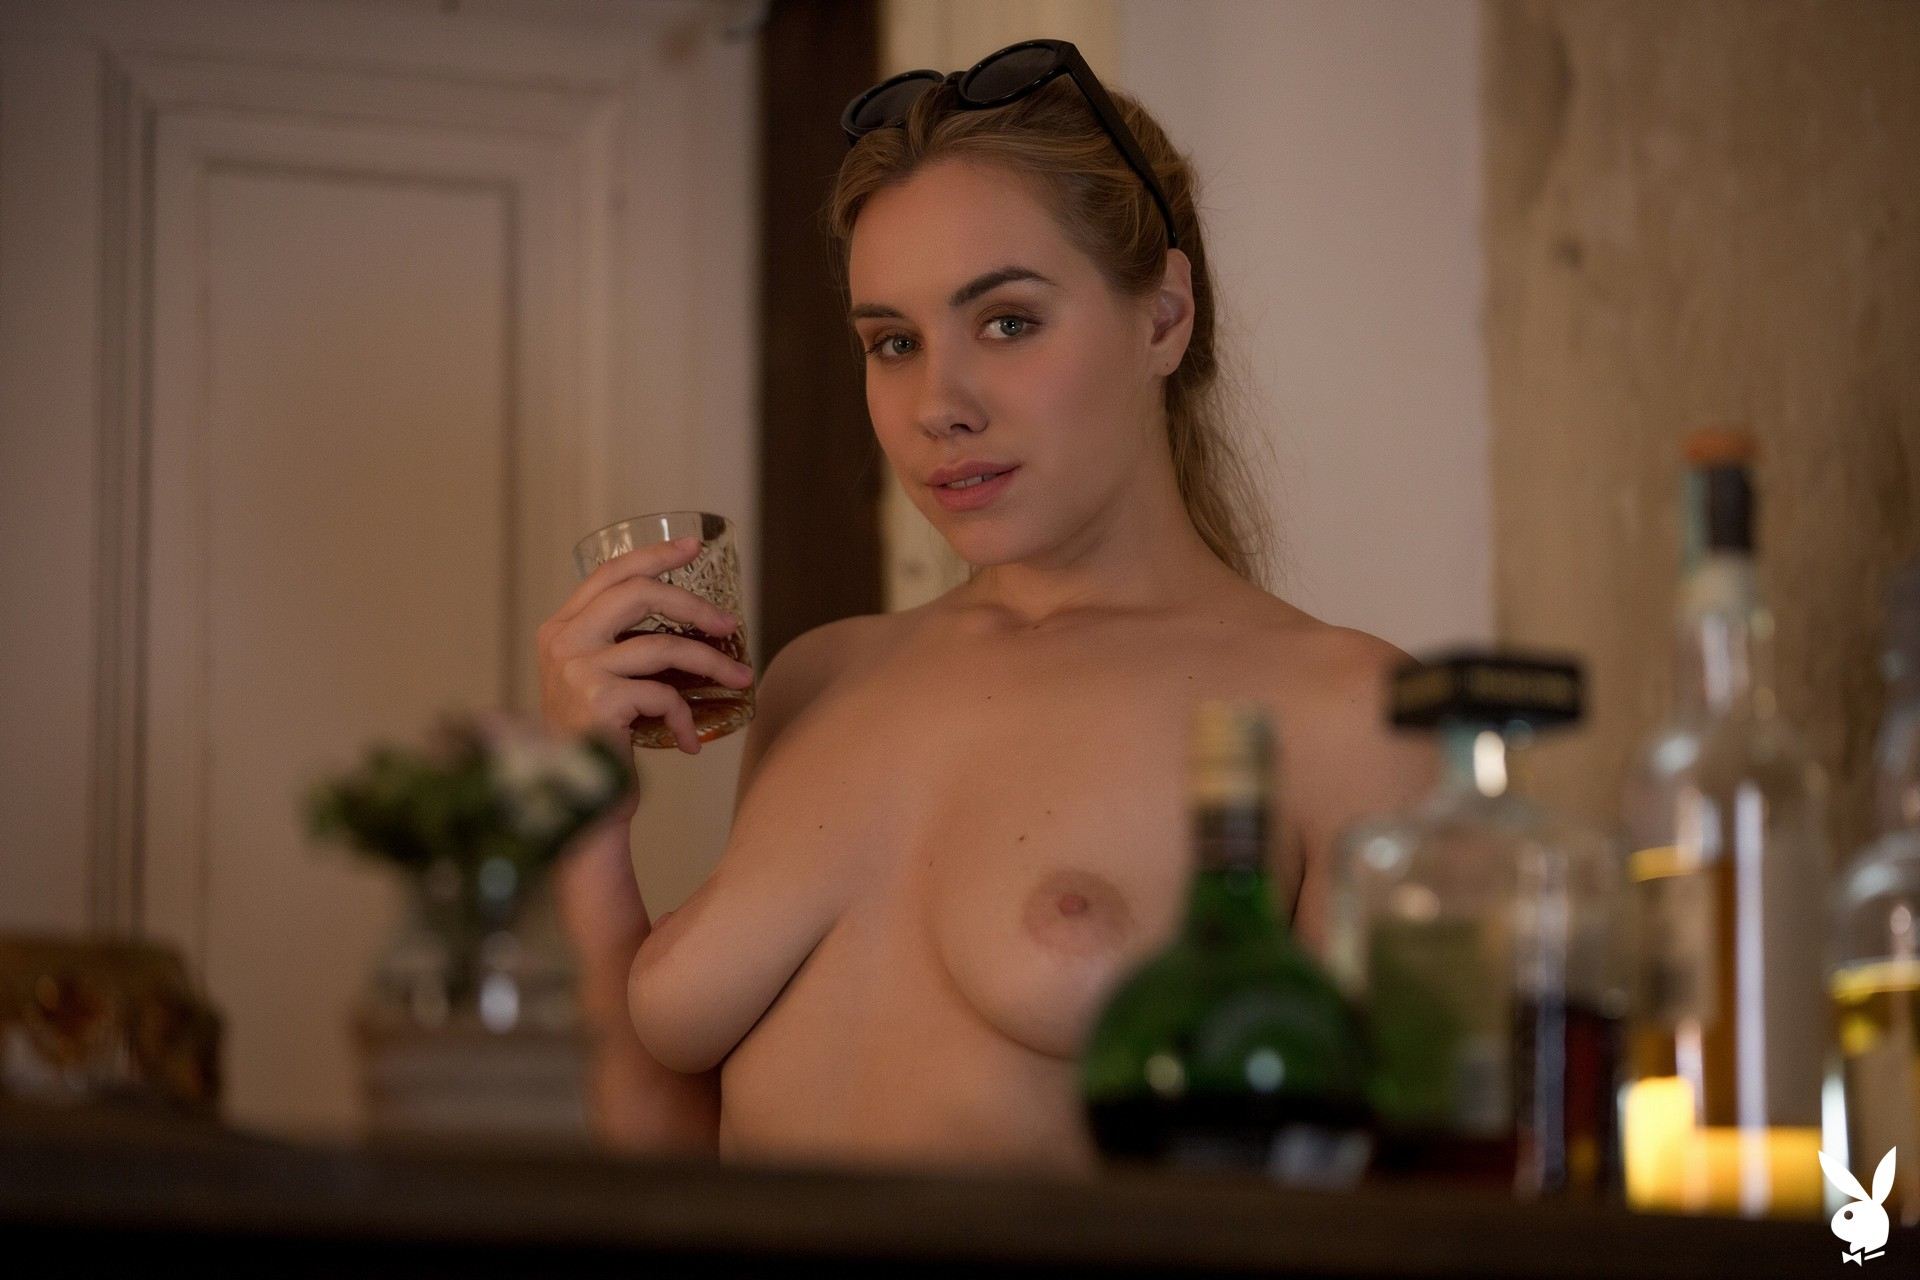 Stefani Kovalyova In Bring Me Love Playboy Plus (18)